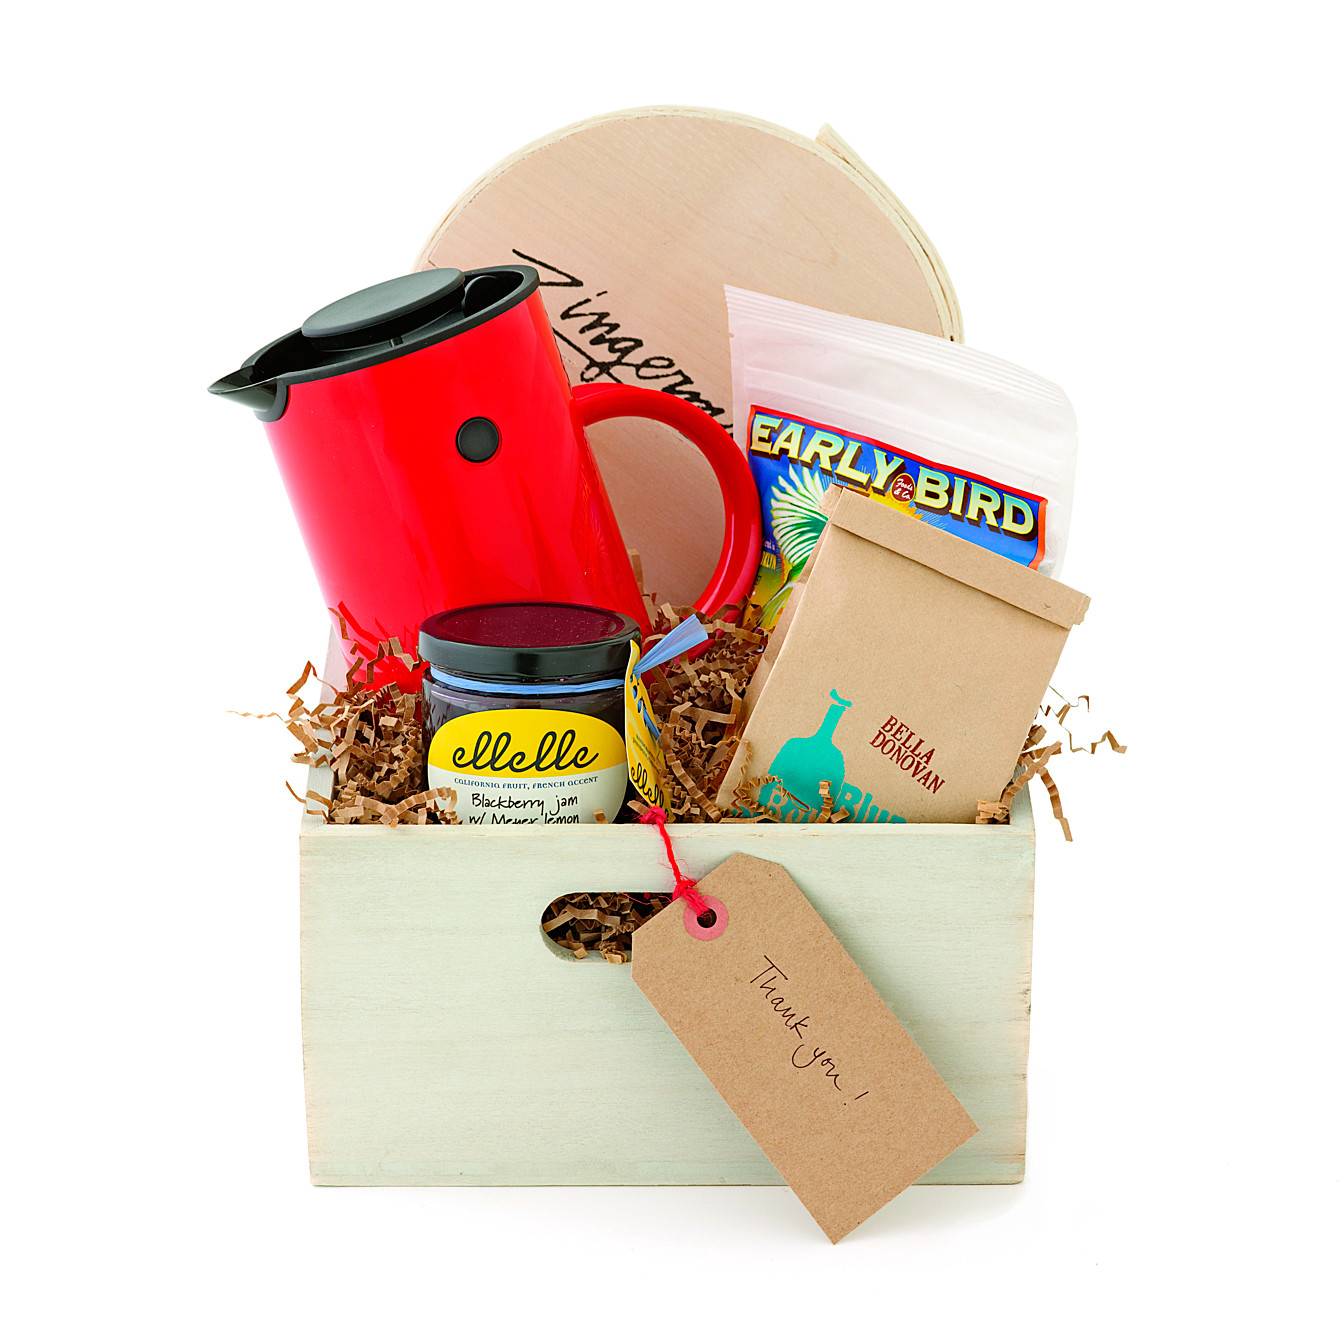 hostess gift ideas martha stewart - HD1339×1339